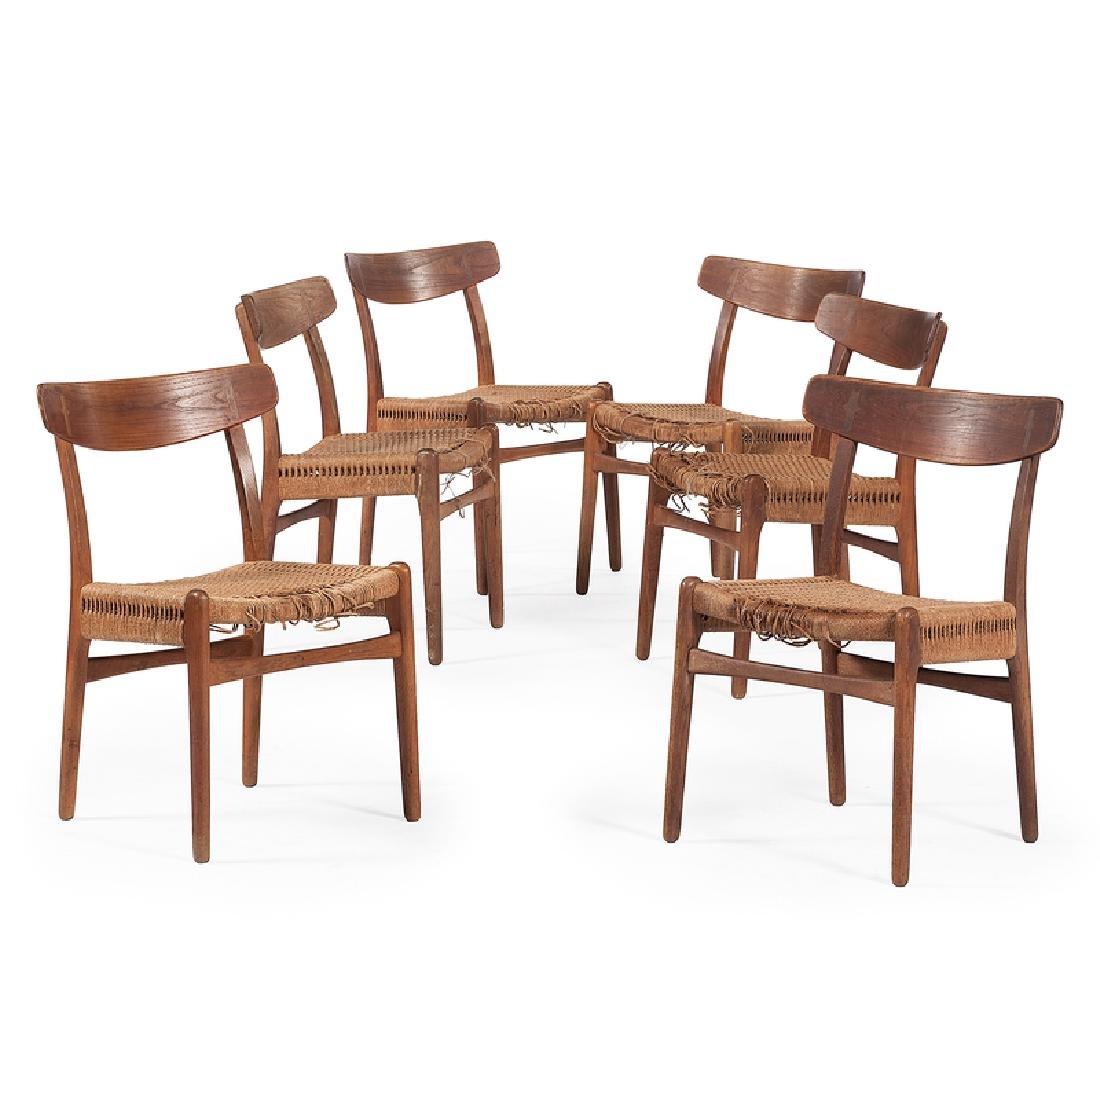 Hans J. Wegner CH-23 Modernist Dining Chairs